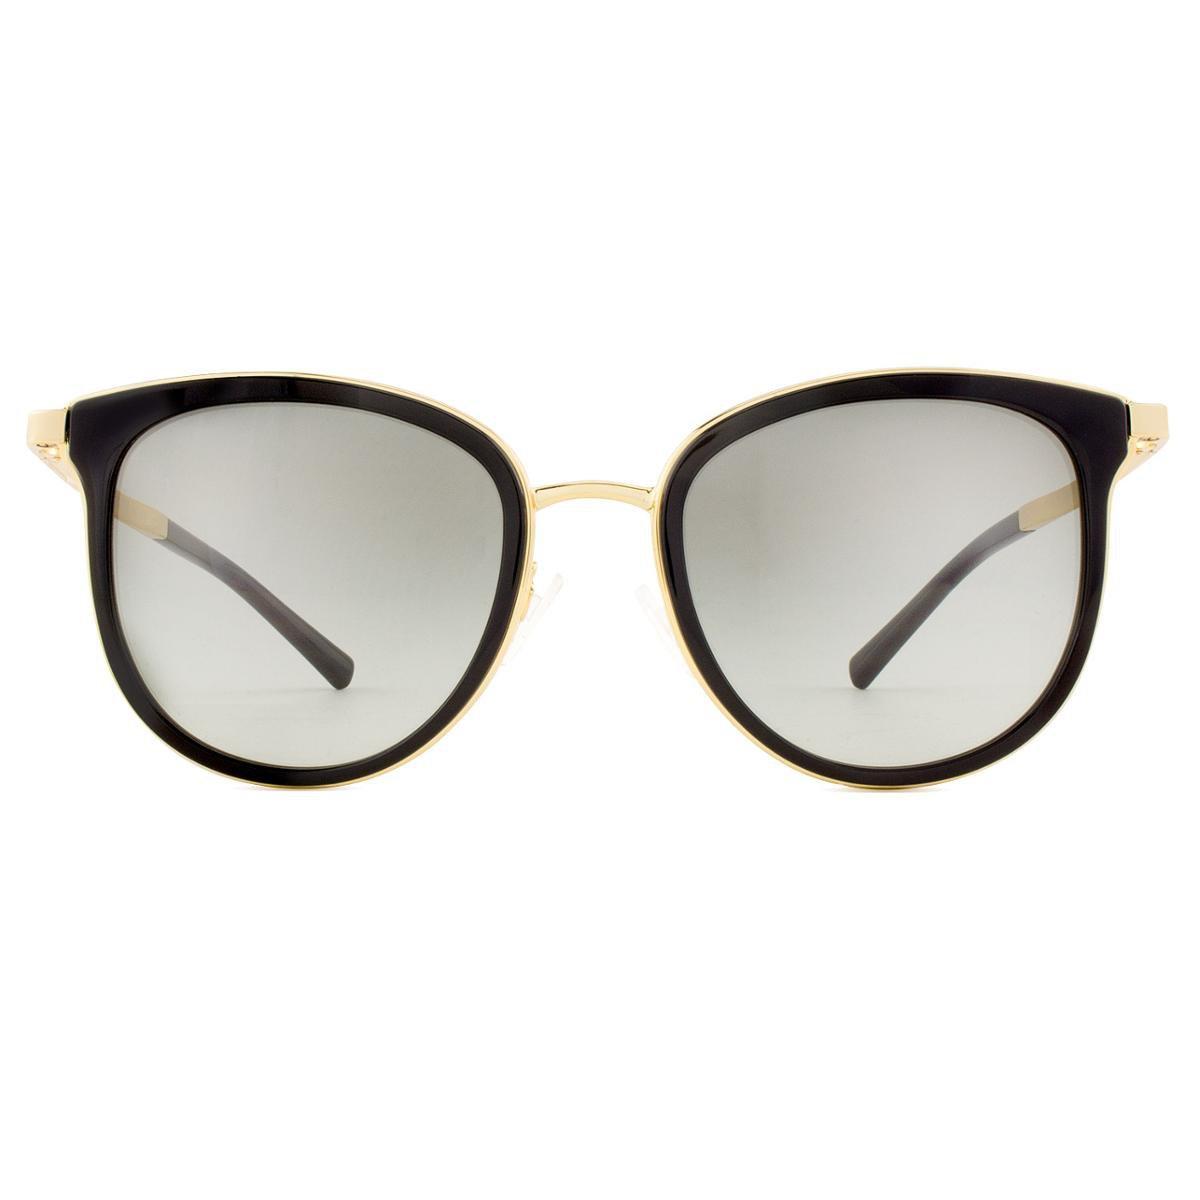 Óculos de Sol Michael Kors Adrianna I MK1010 110011-54 Feminino ... dc60f9a320